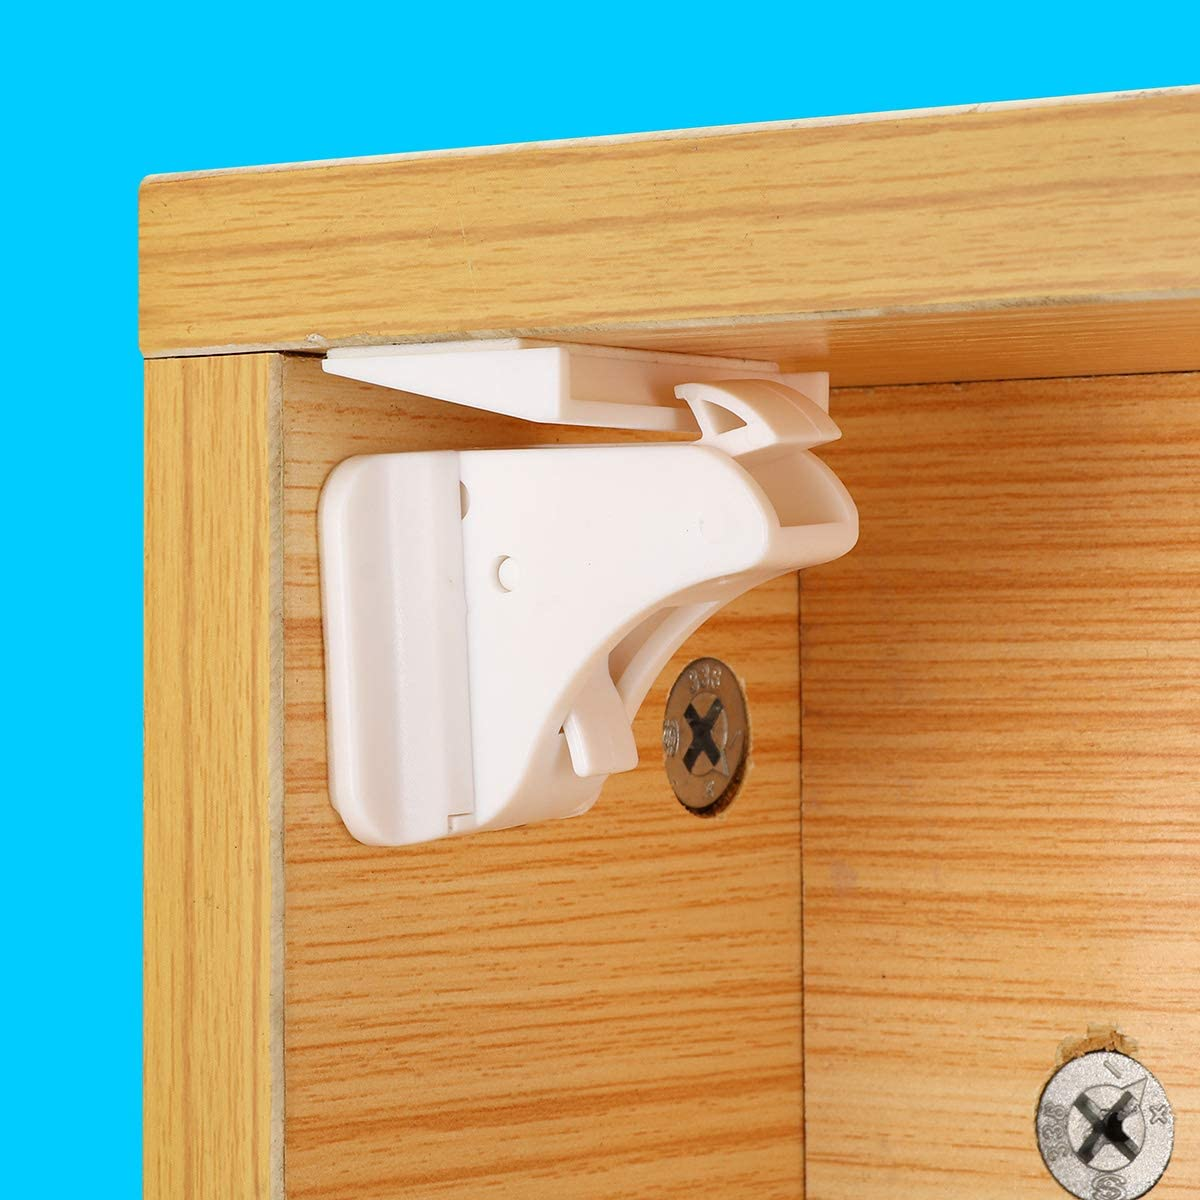 Generic 12 in 1 Magnetic Child Lock Baby Safety Lock Baby Protection Cabinet Door Lock Kids Drawer Locker